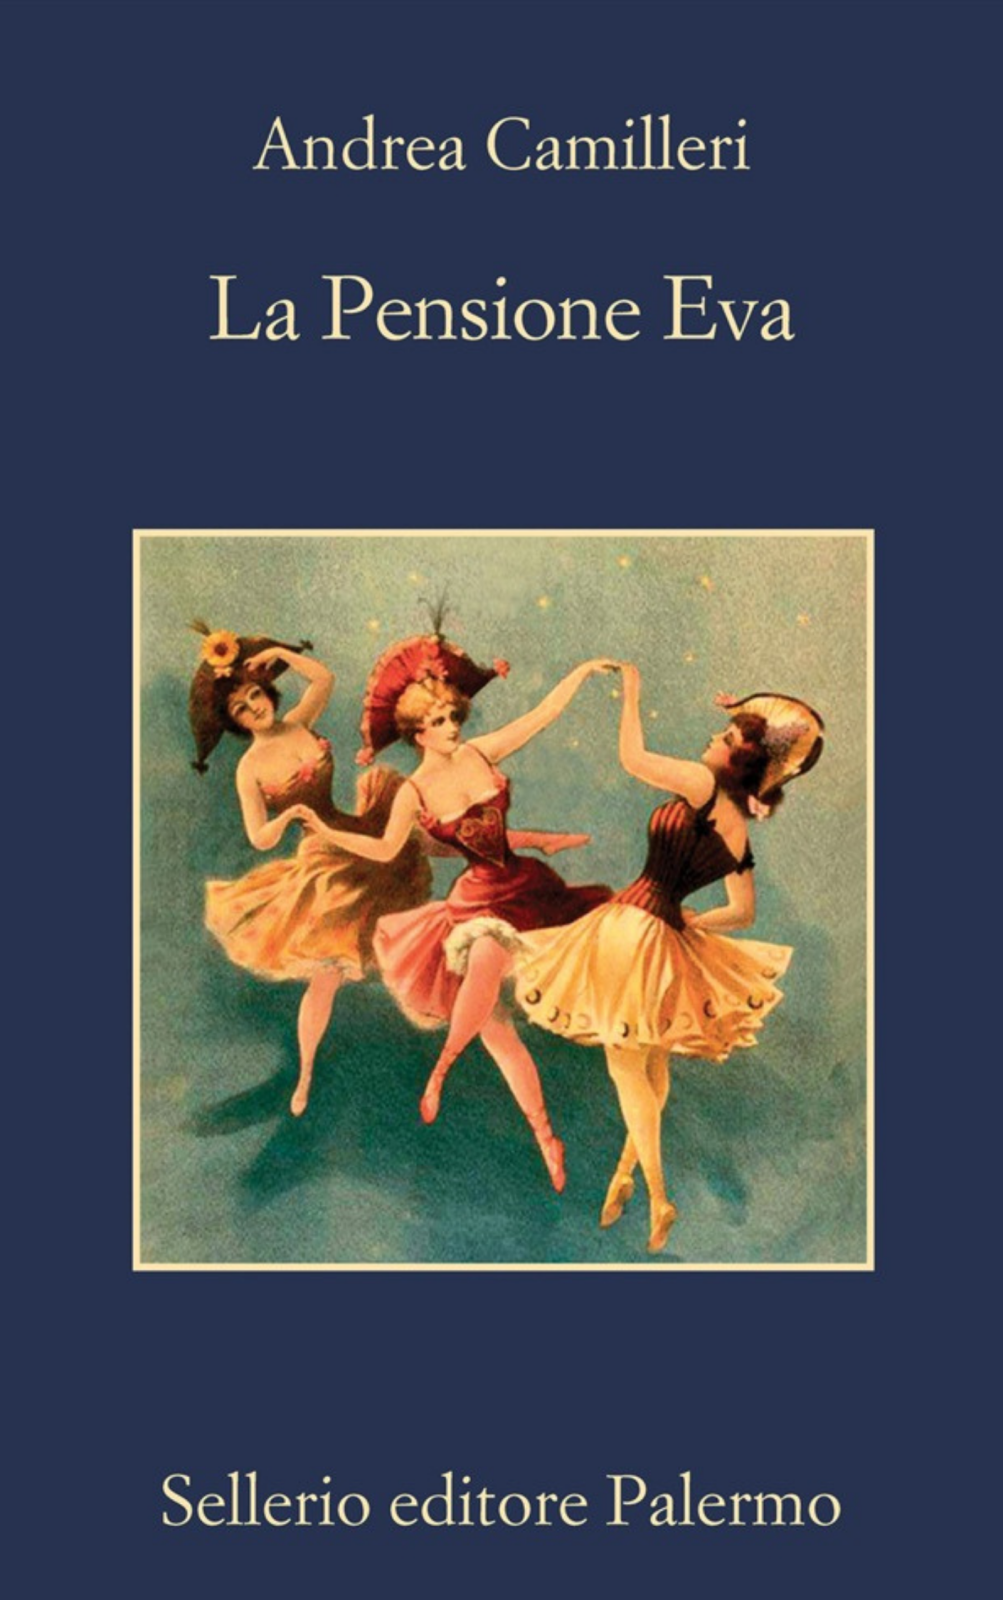 Camilleri - La pensione Eva